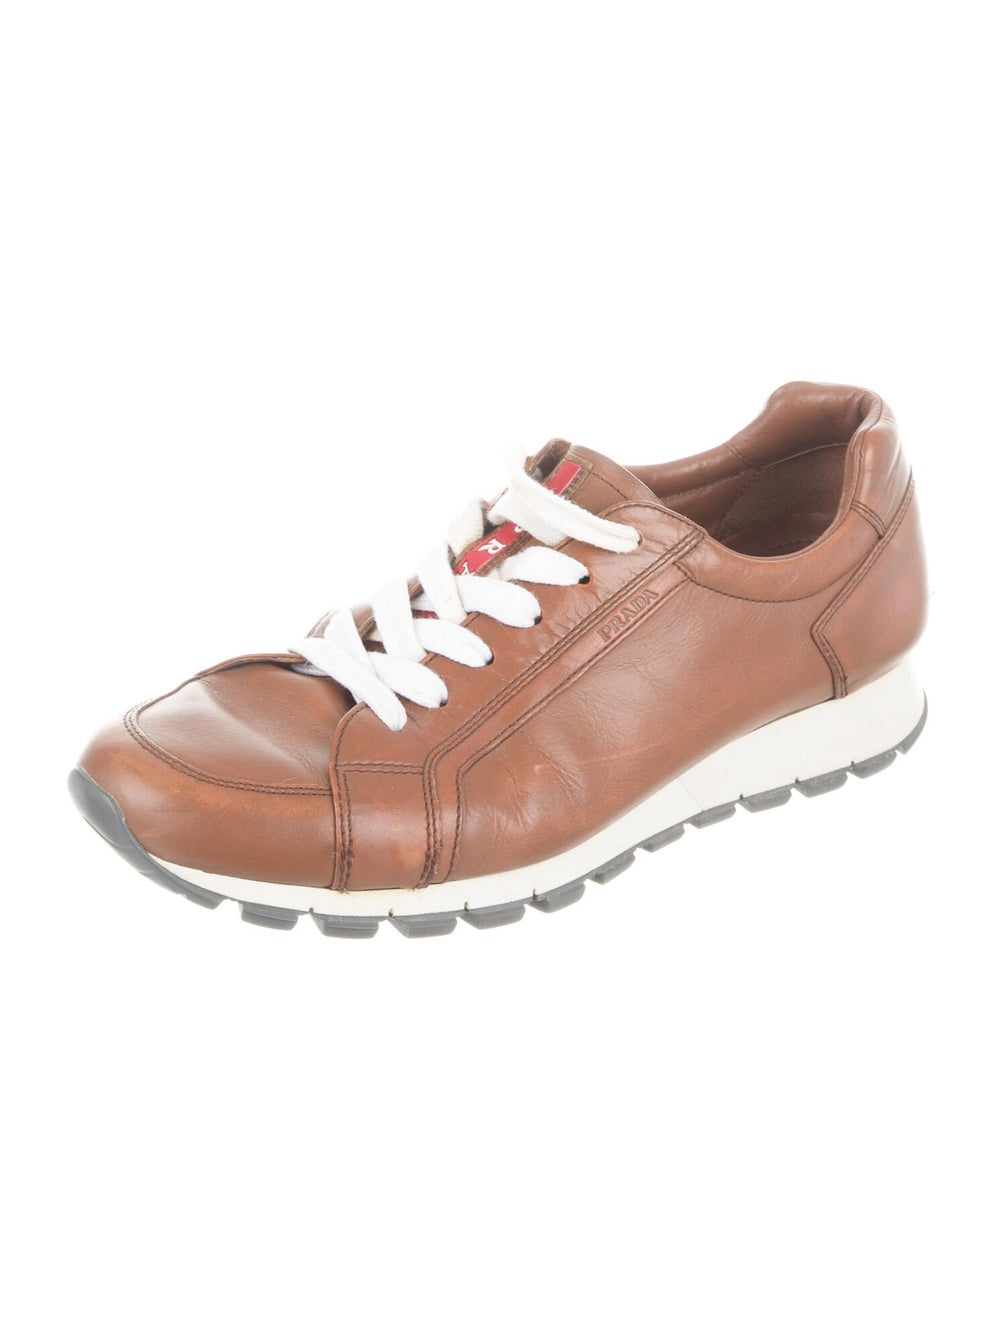 Prada Sport Leather Sneakers Brown - image 2